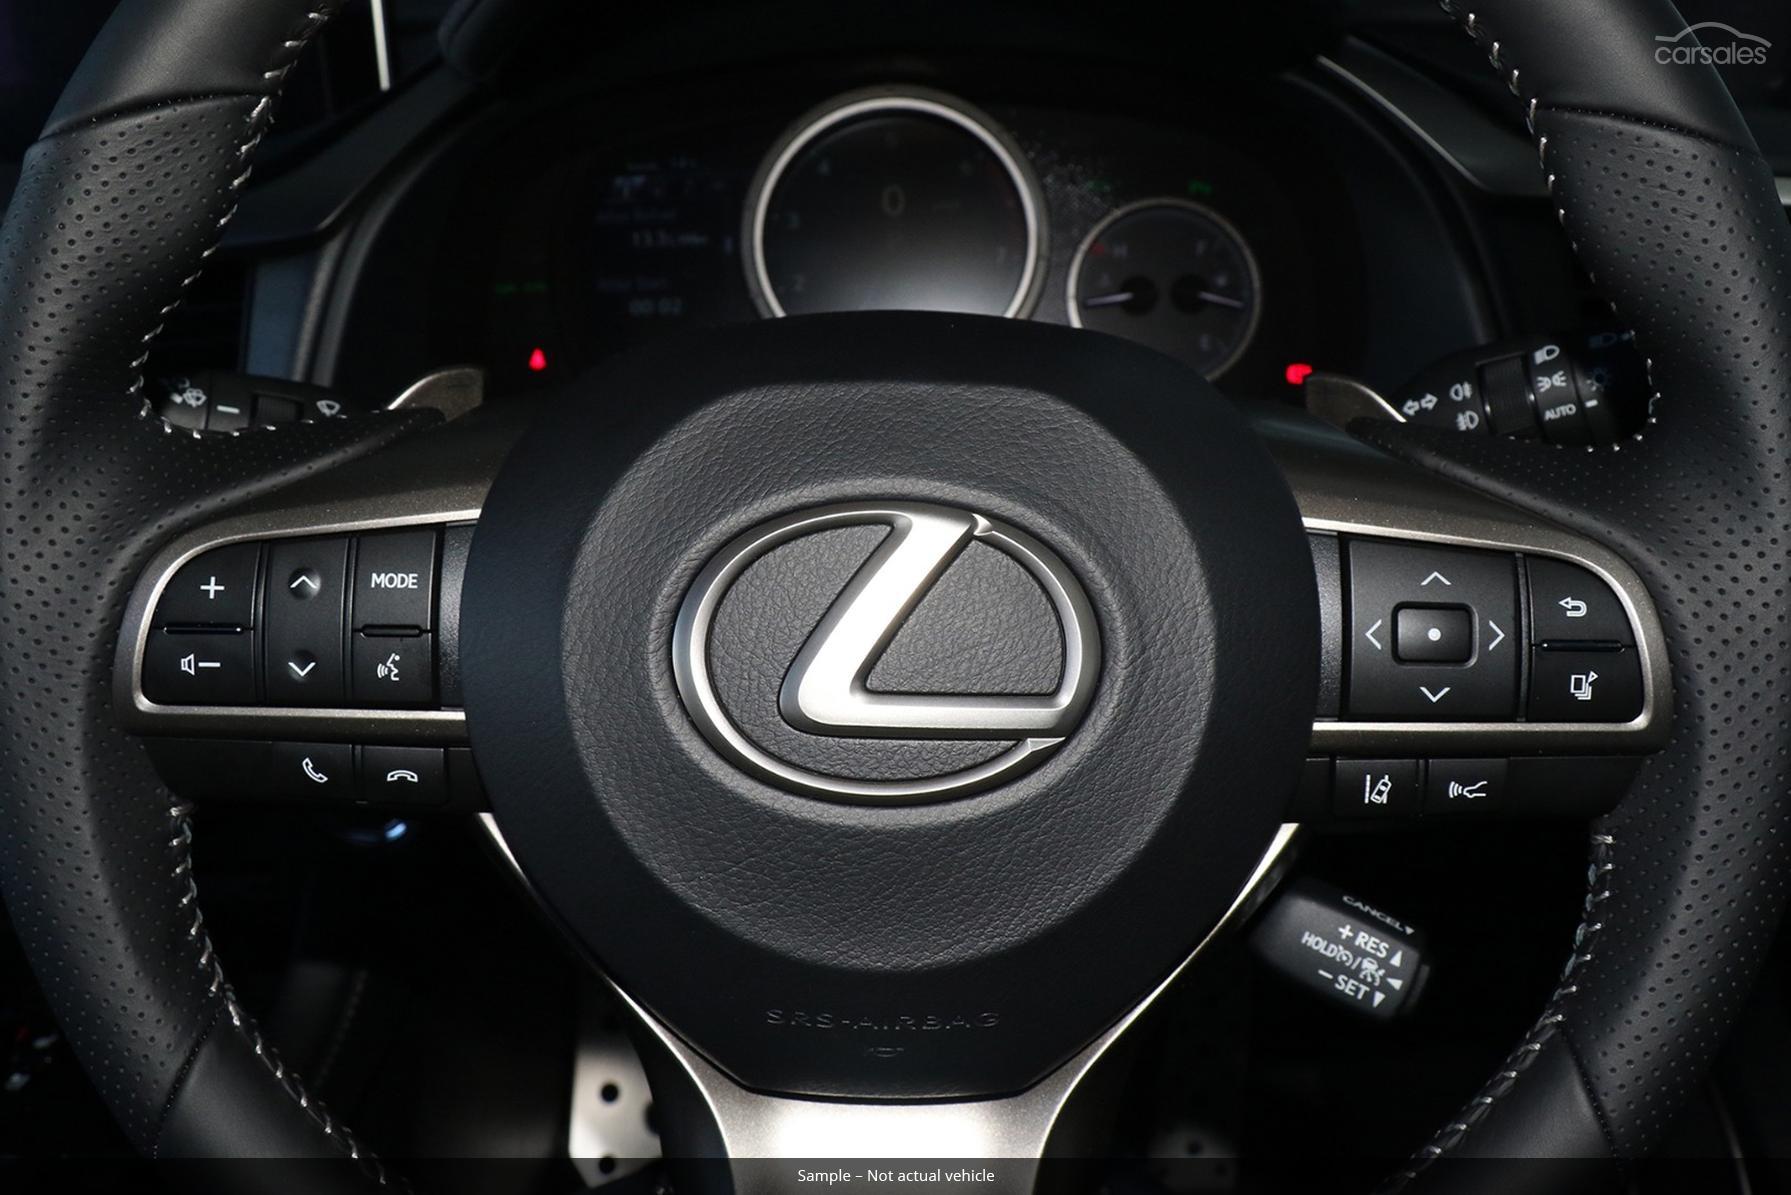 2019 Lexus RX300 F Sport Auto-SHRM-AD-6013267 - carsales com au